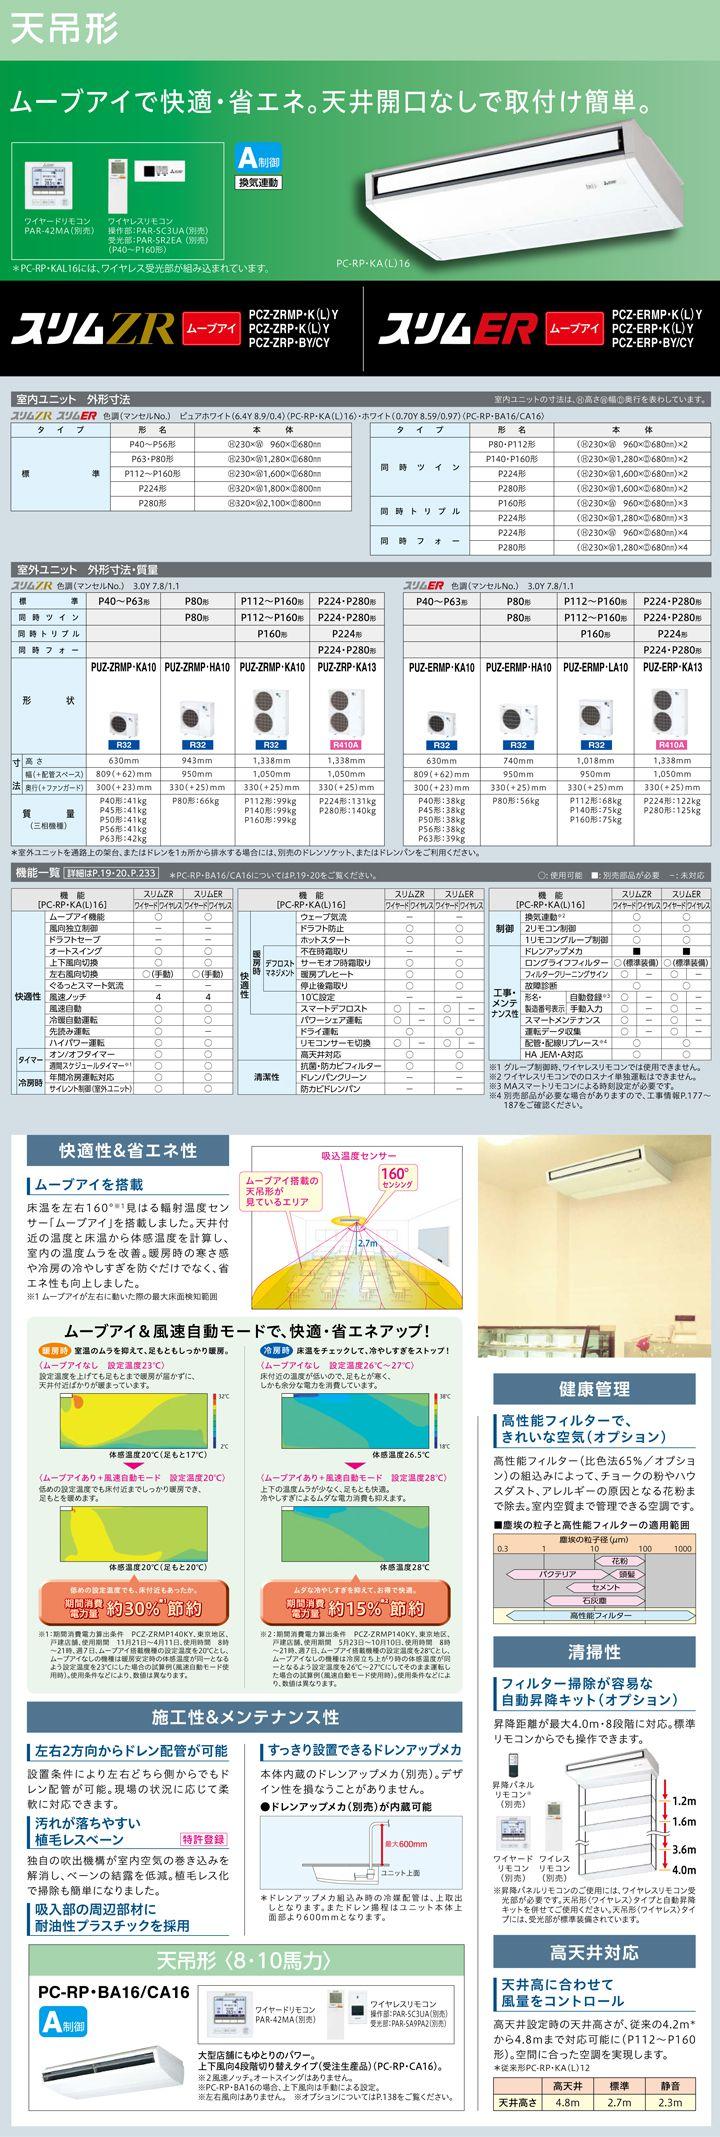 PCZD-ERP280KYカタログ